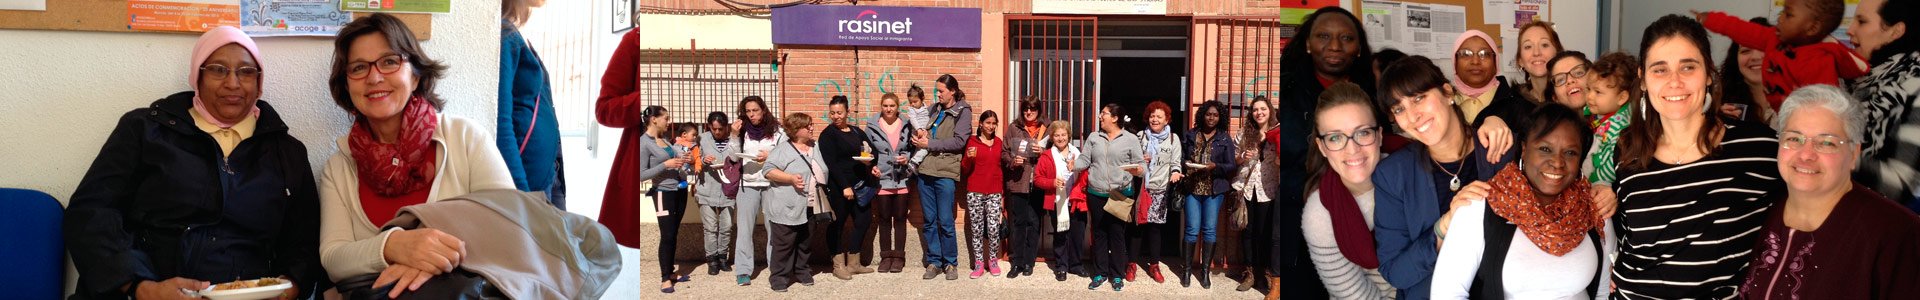 rasinet-1